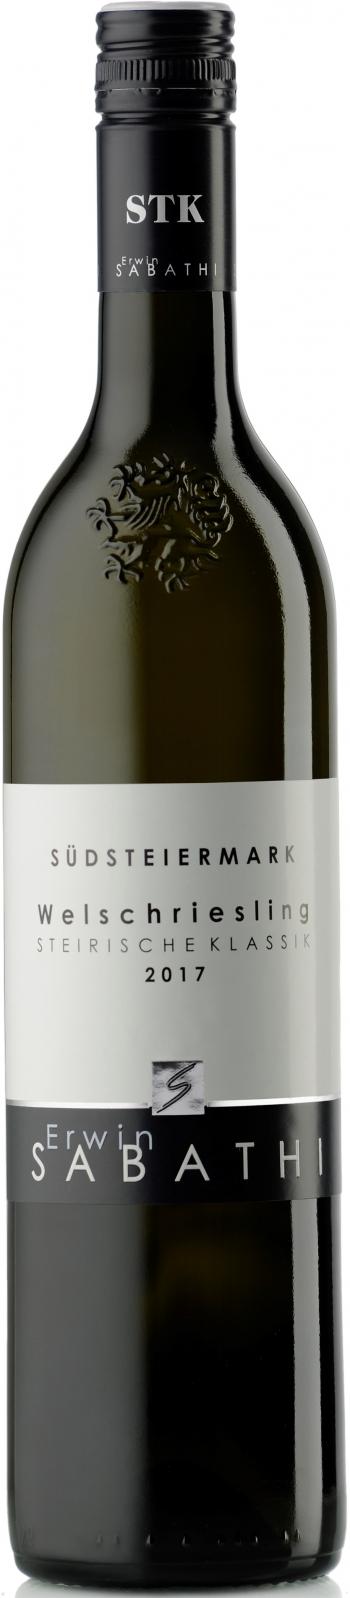 Welschriesling steir. Klassik Sabathi 2017